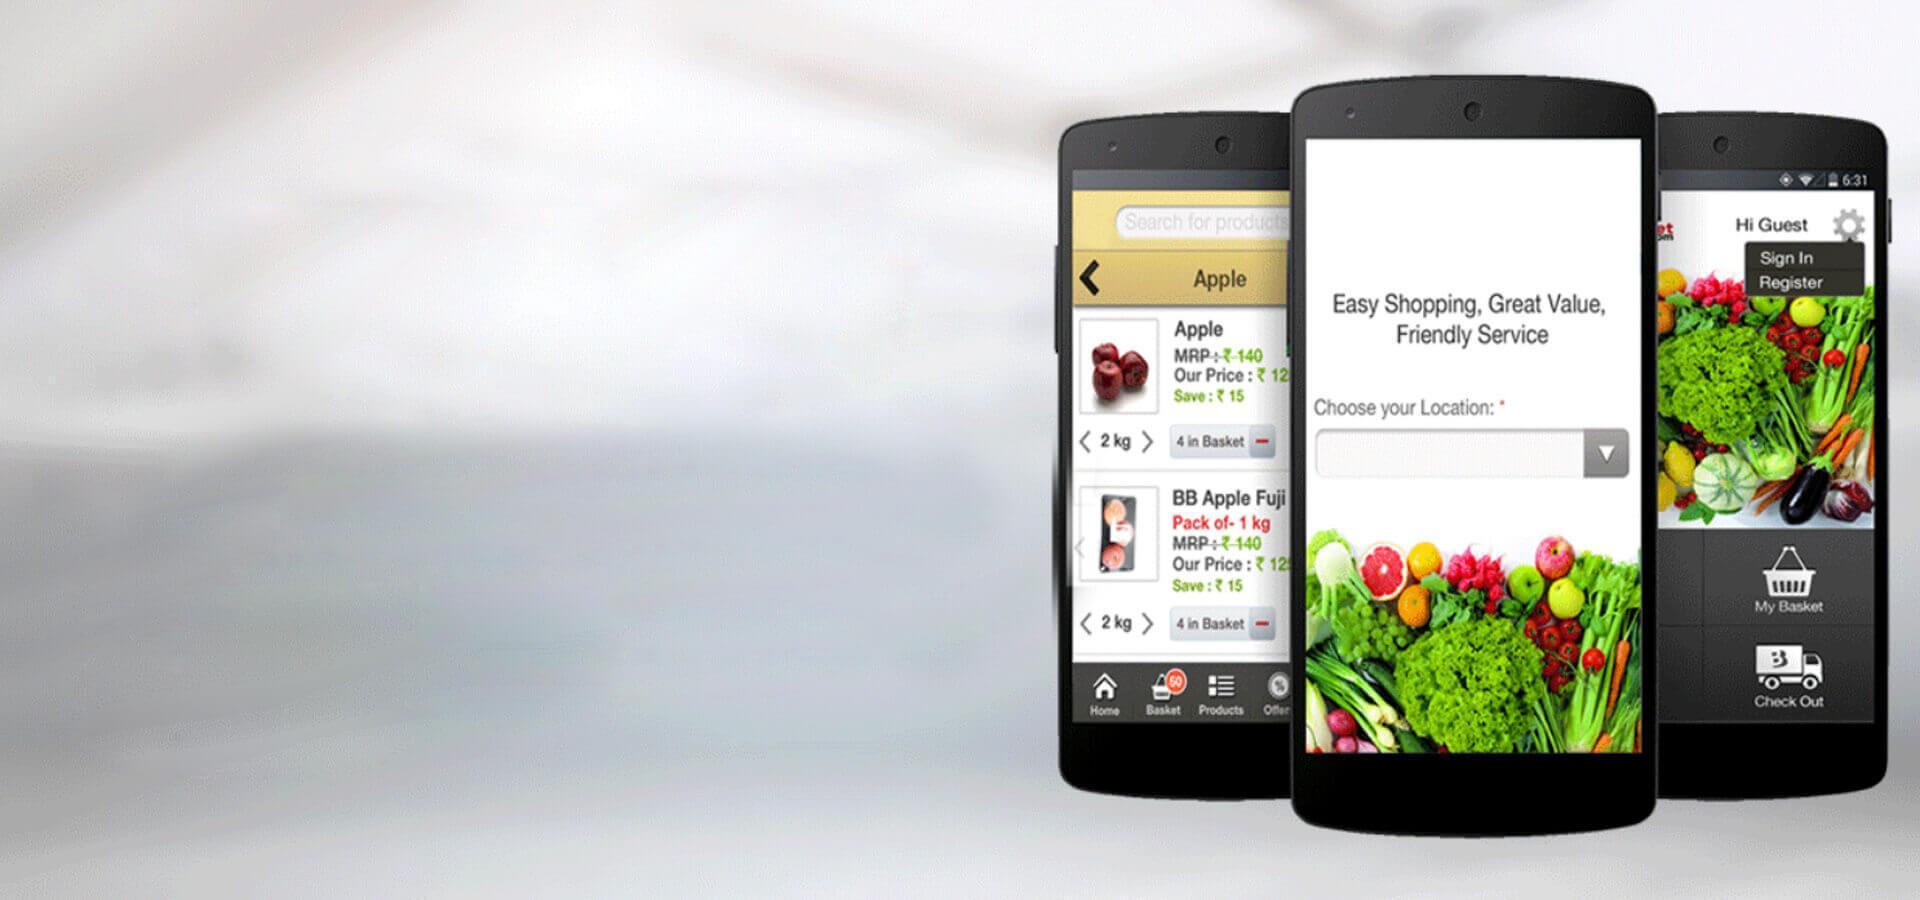 iPhone App Design Service - Hire iPhone App UI Design